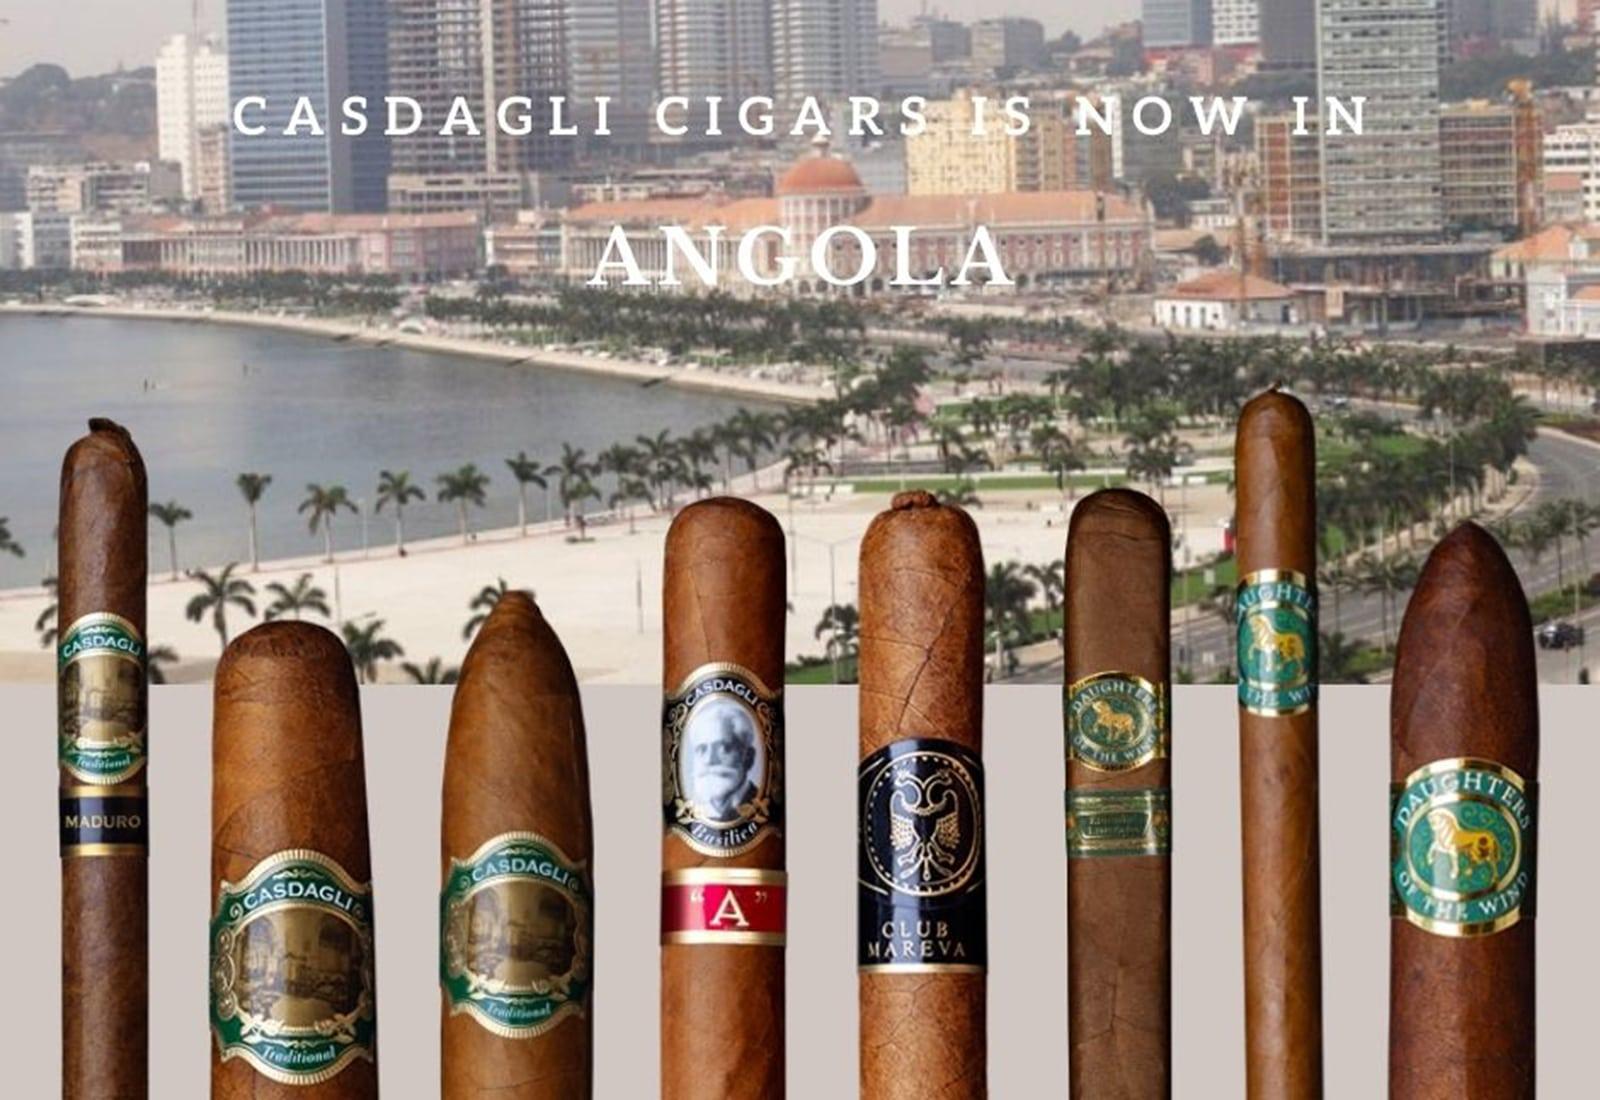 Casdagli Cigars Angola